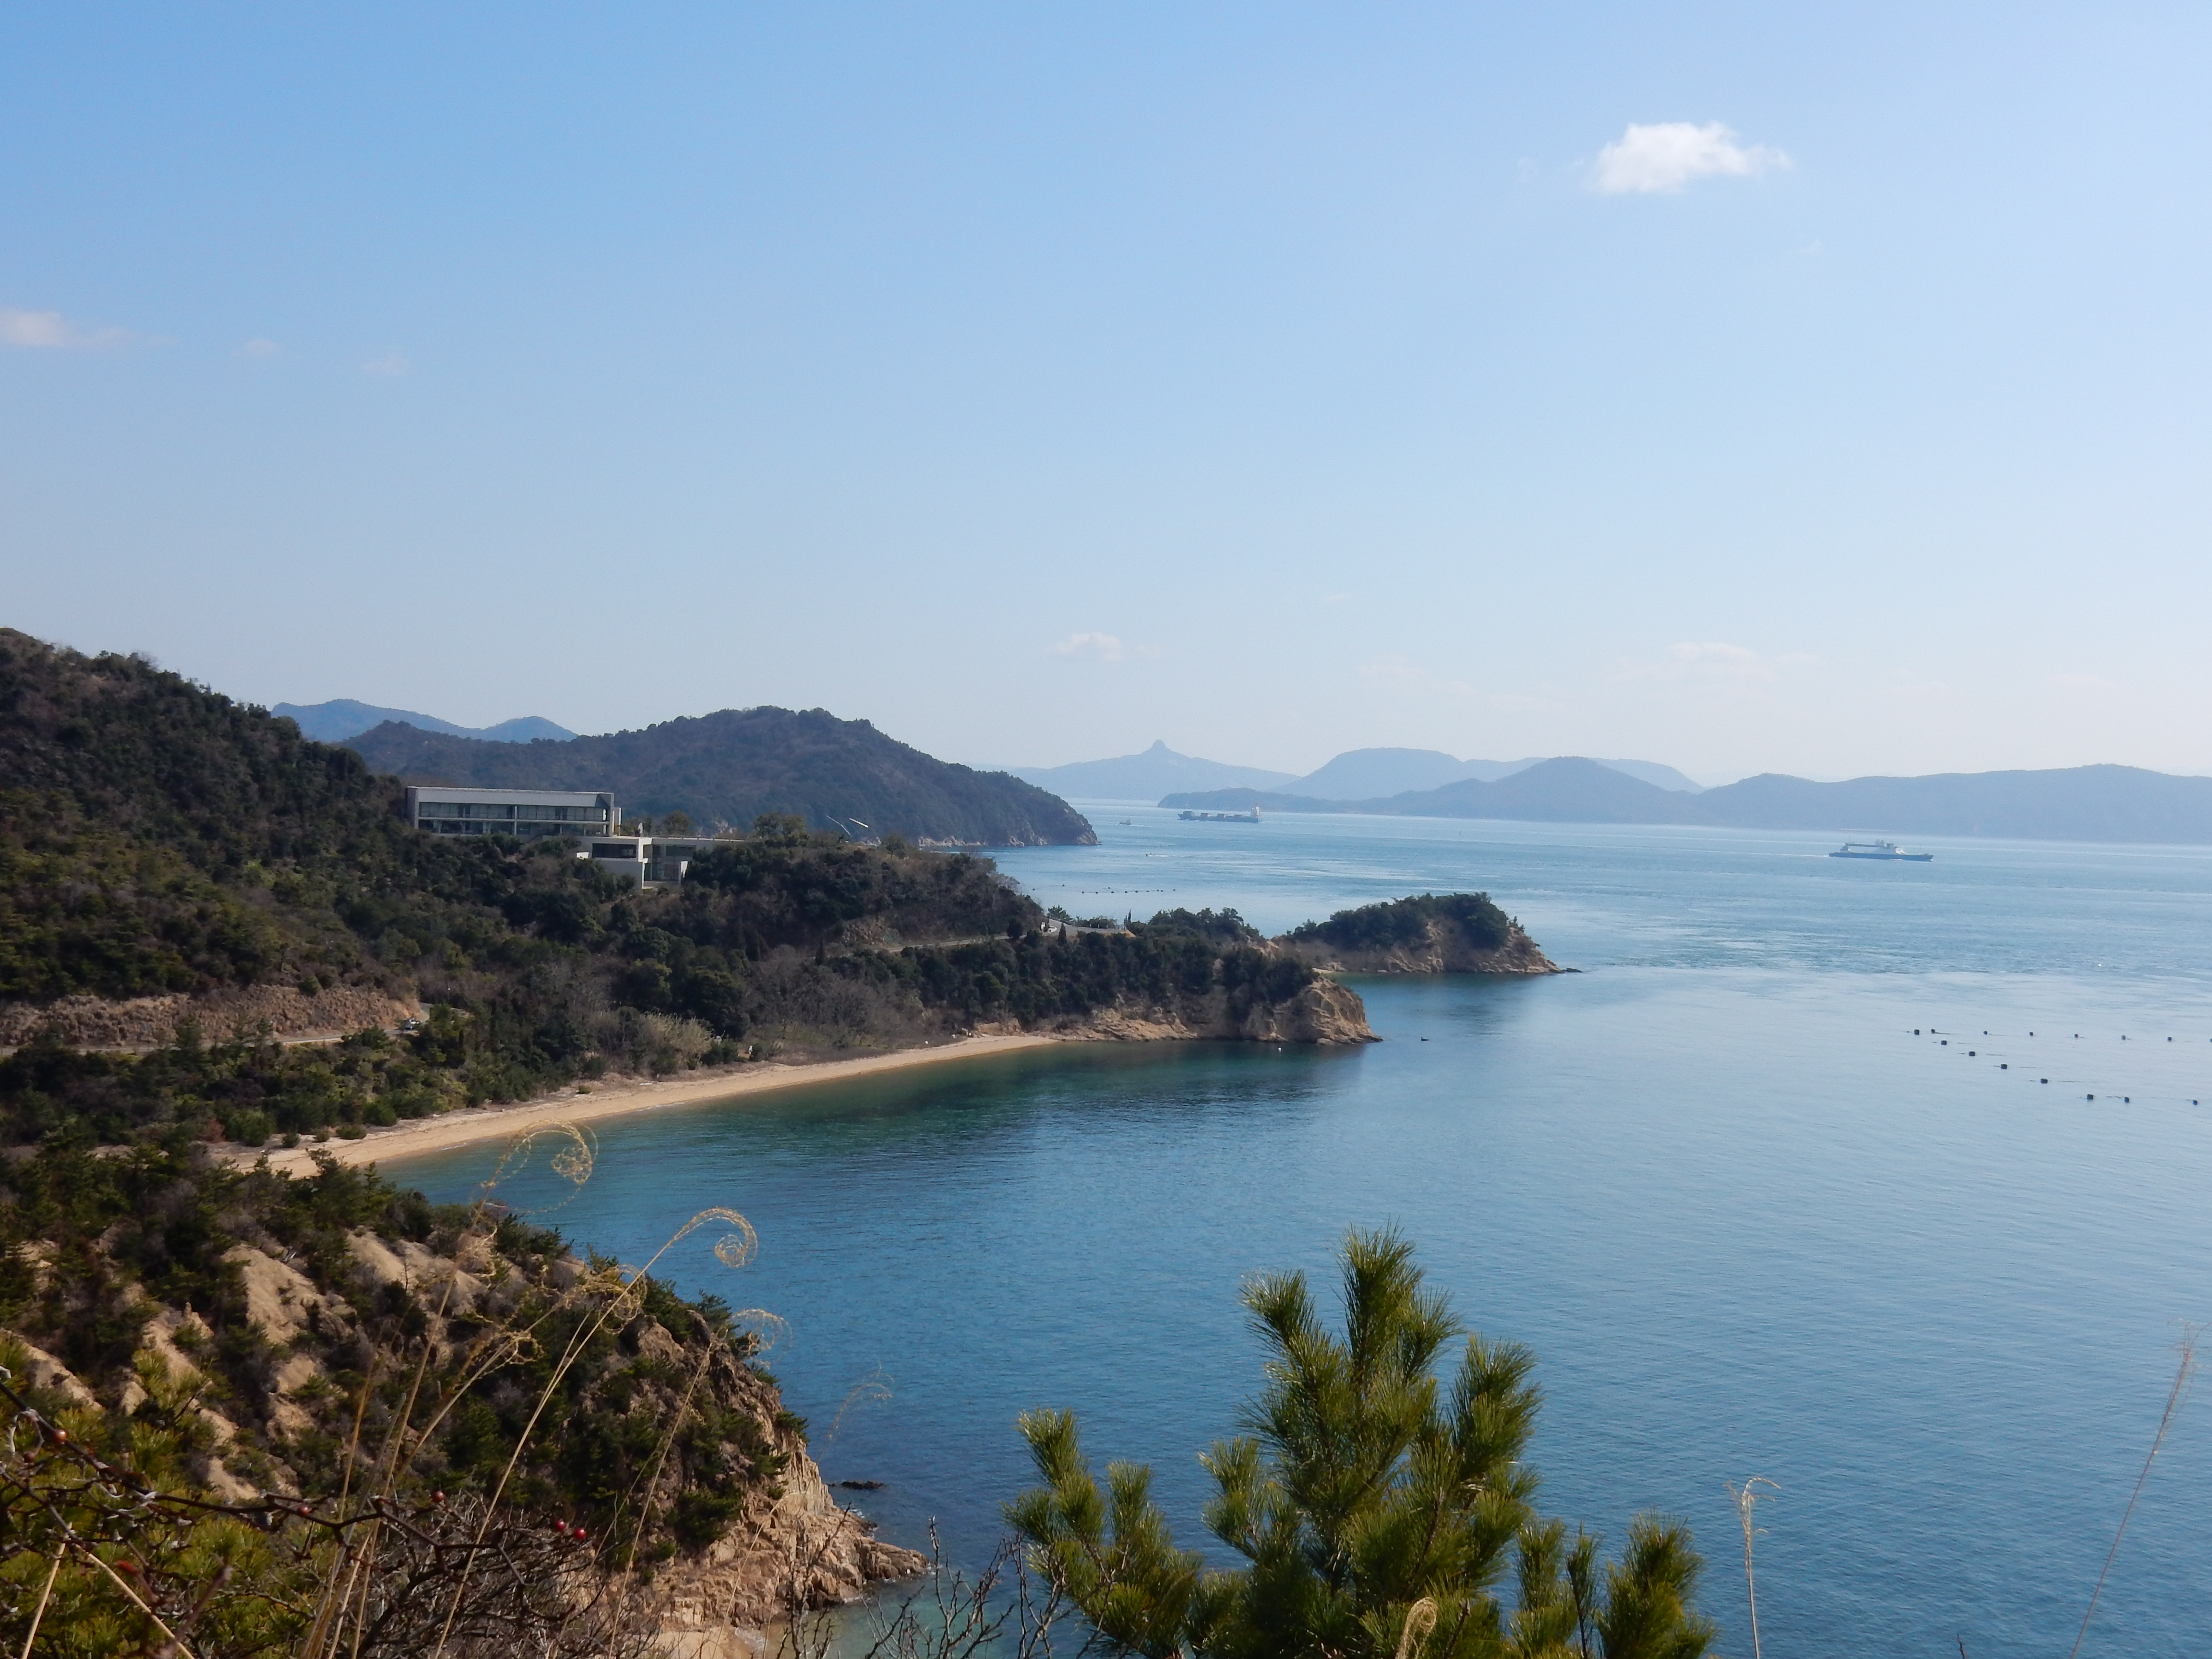 Japan's Art Island: Naoshima